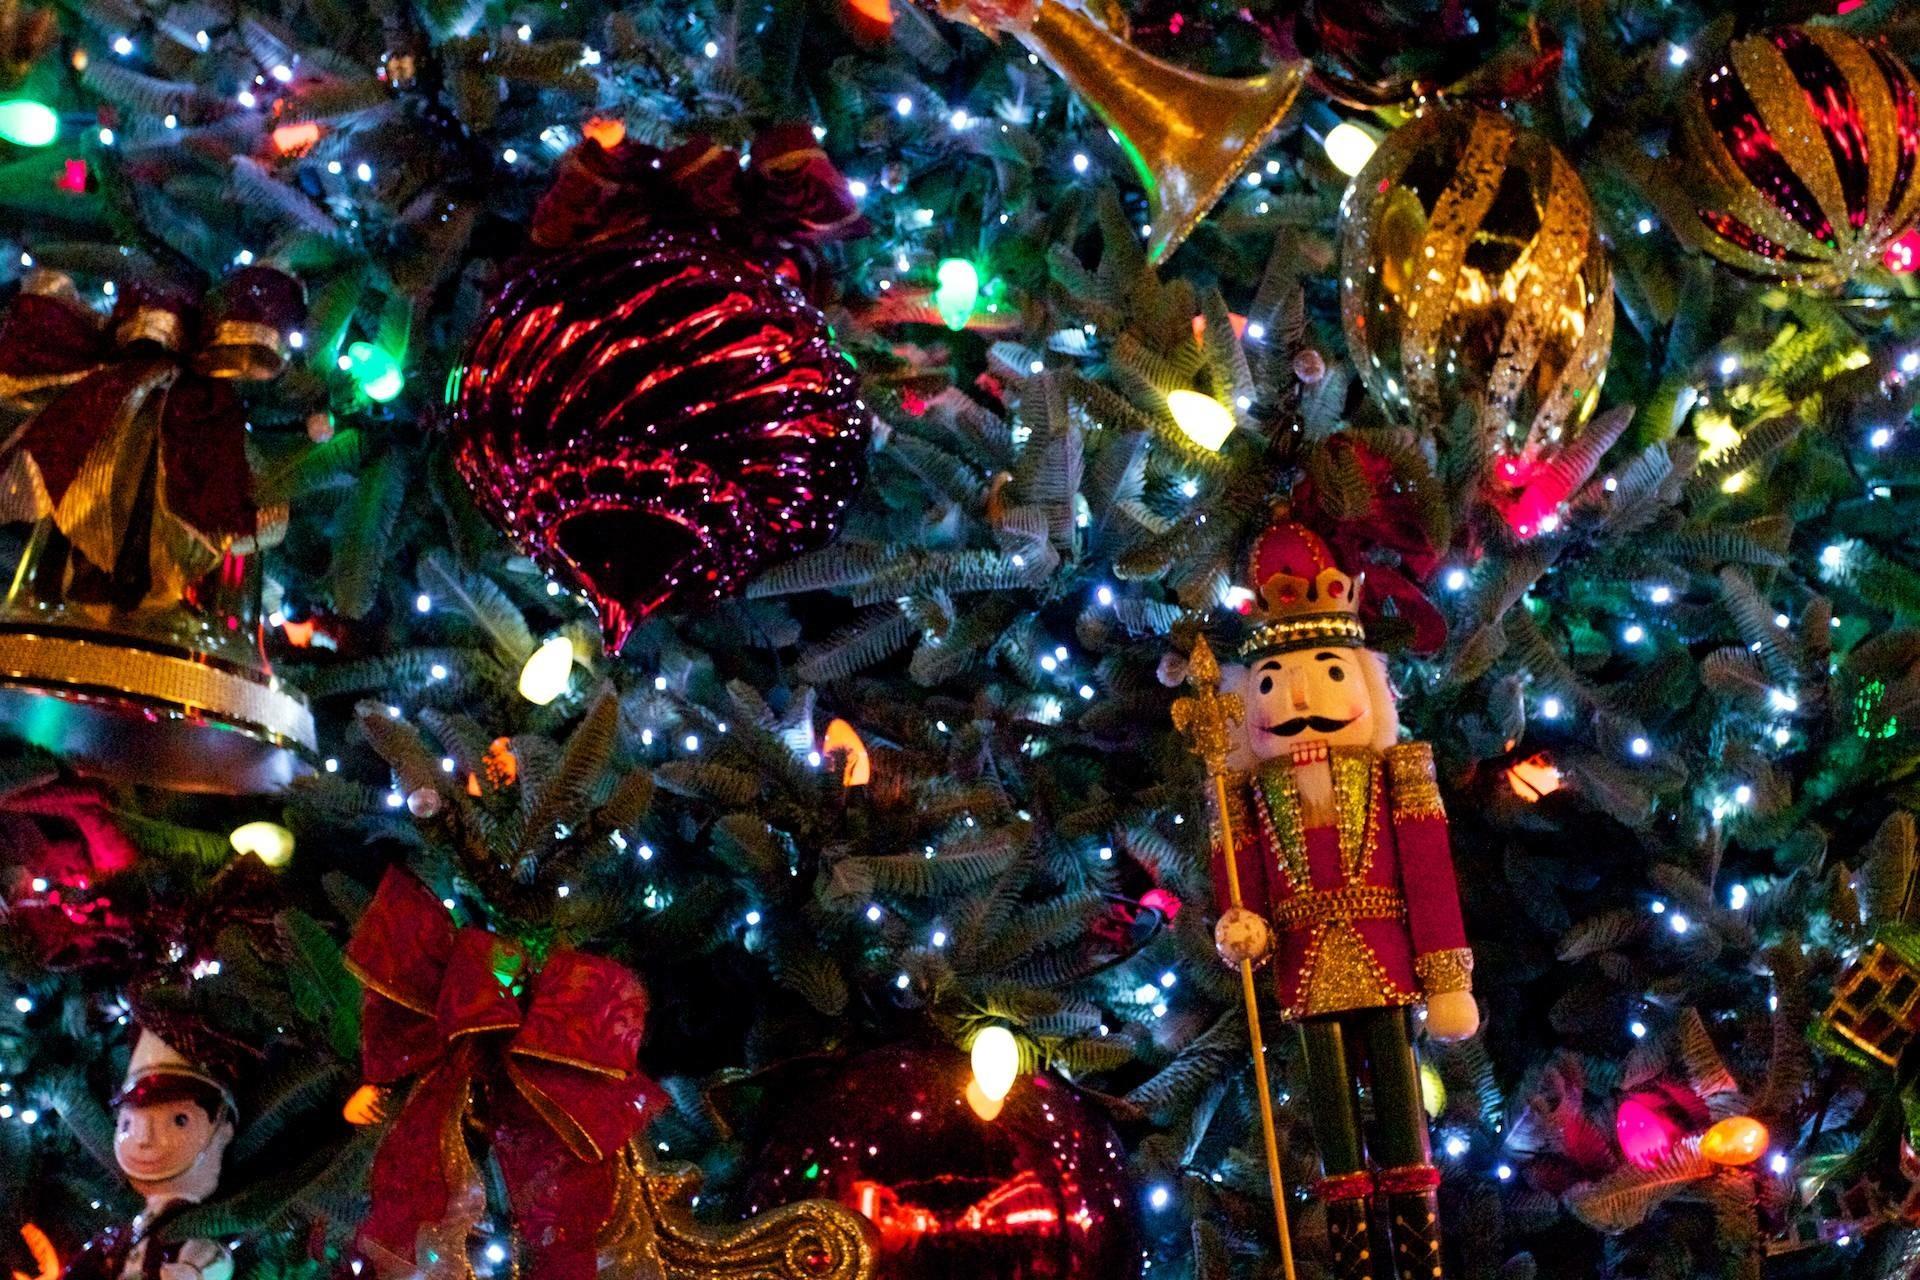 Christmas Tree with Nutcracker Desktop Wallpaper 1920x1280PX .